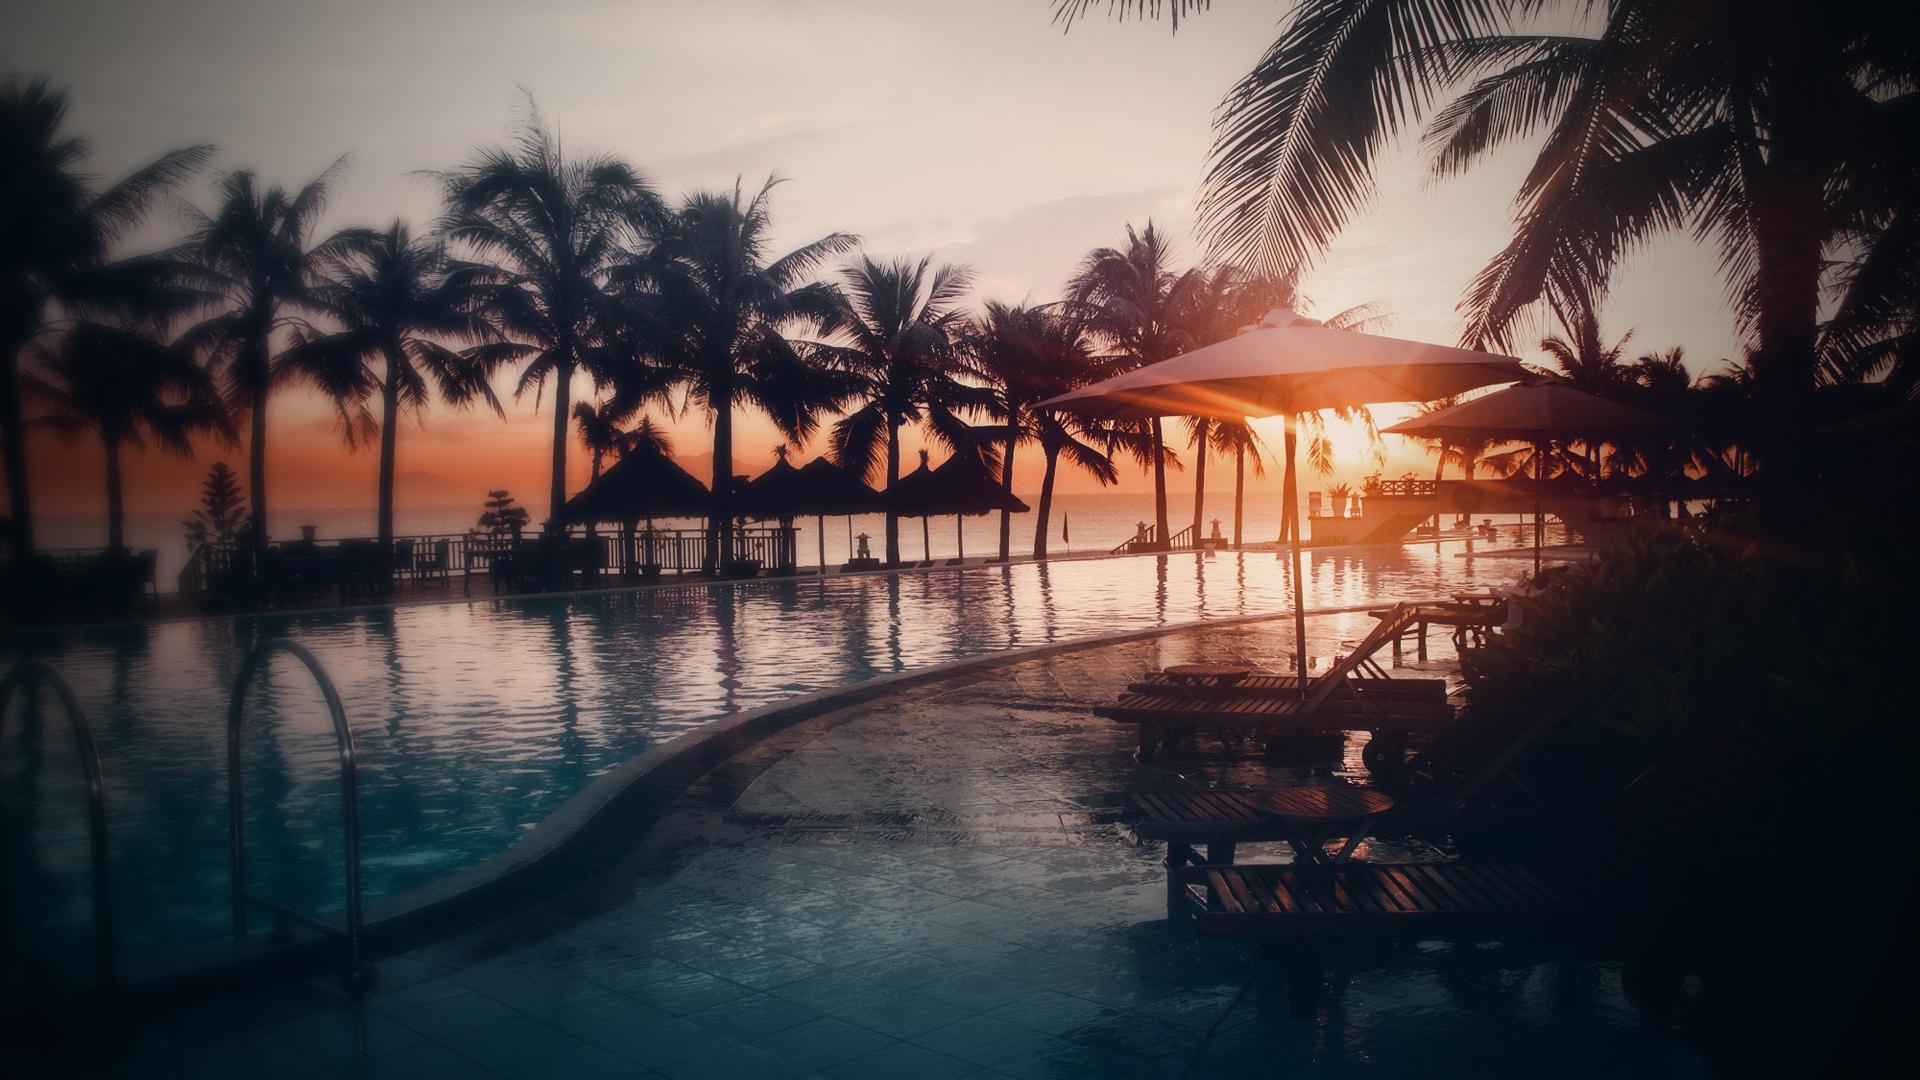 Sunset Over Beach Of Palm Trees Hd Wallpaper: Fondos De Pantalla Piscina, Agua, Playa, Mar, Palmeras